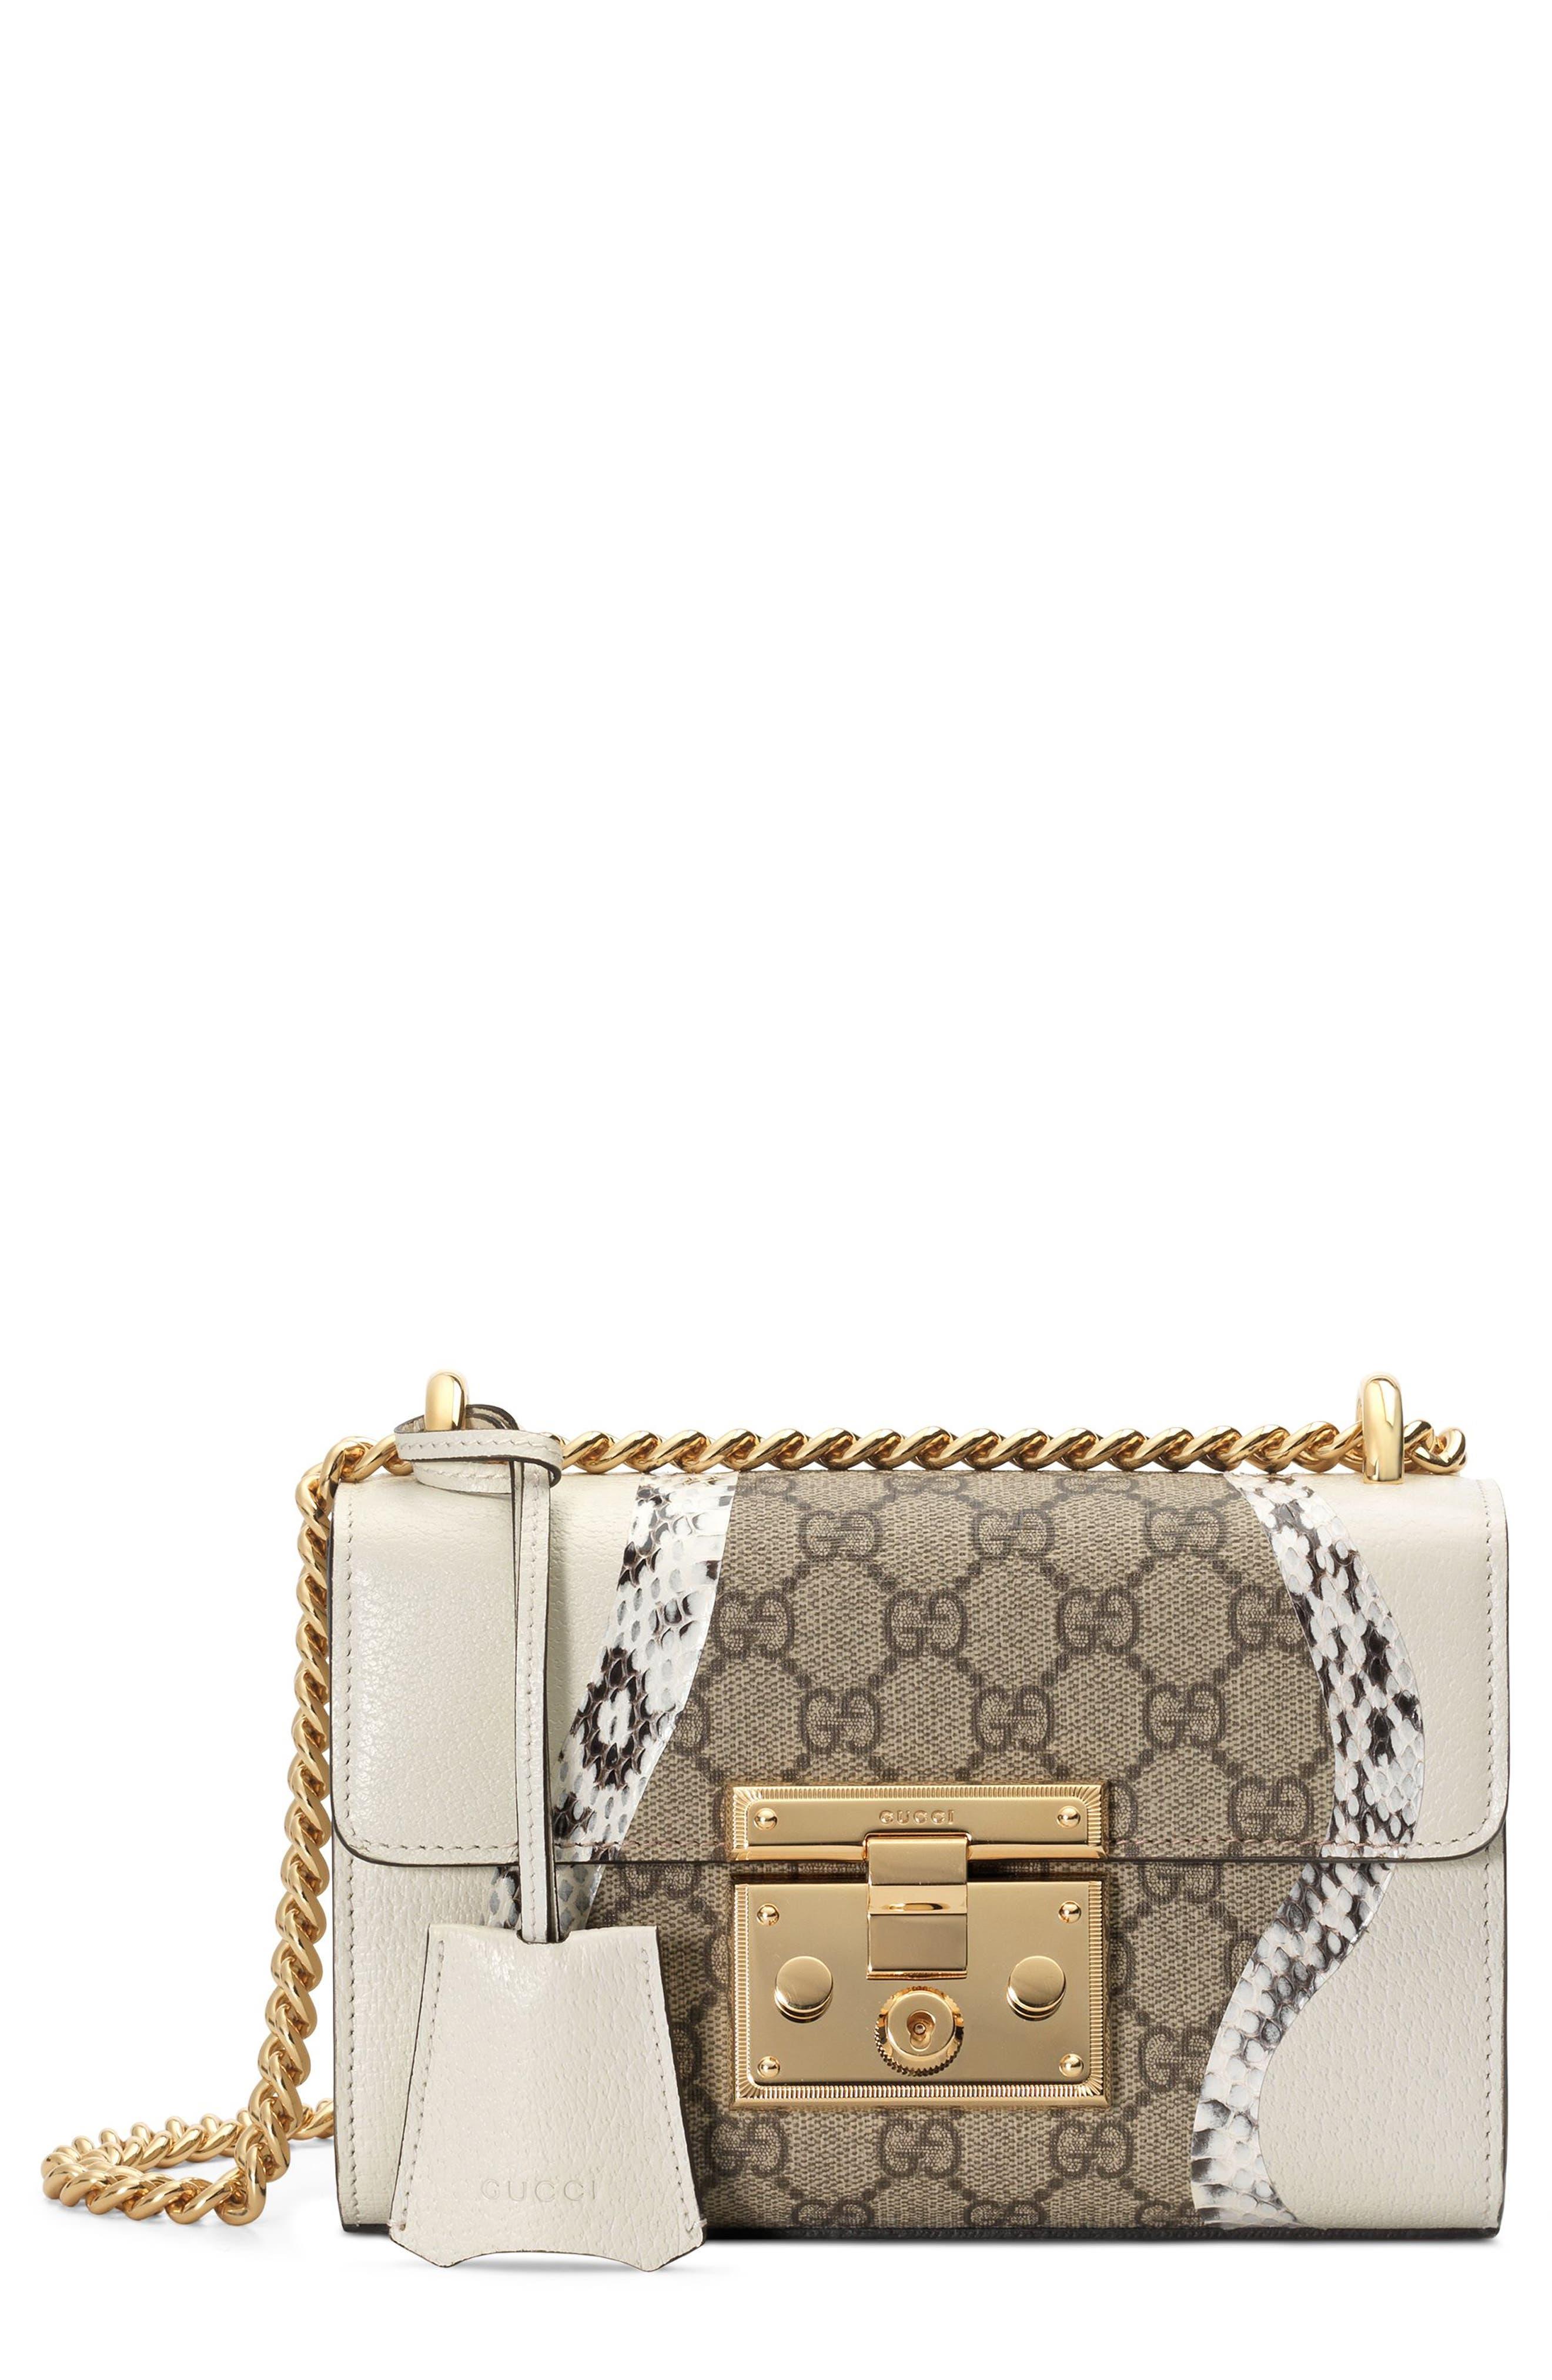 Gucci Small Padlock GG Supreme Wave Shoulder Bag with Genuine Snakeskin Trim